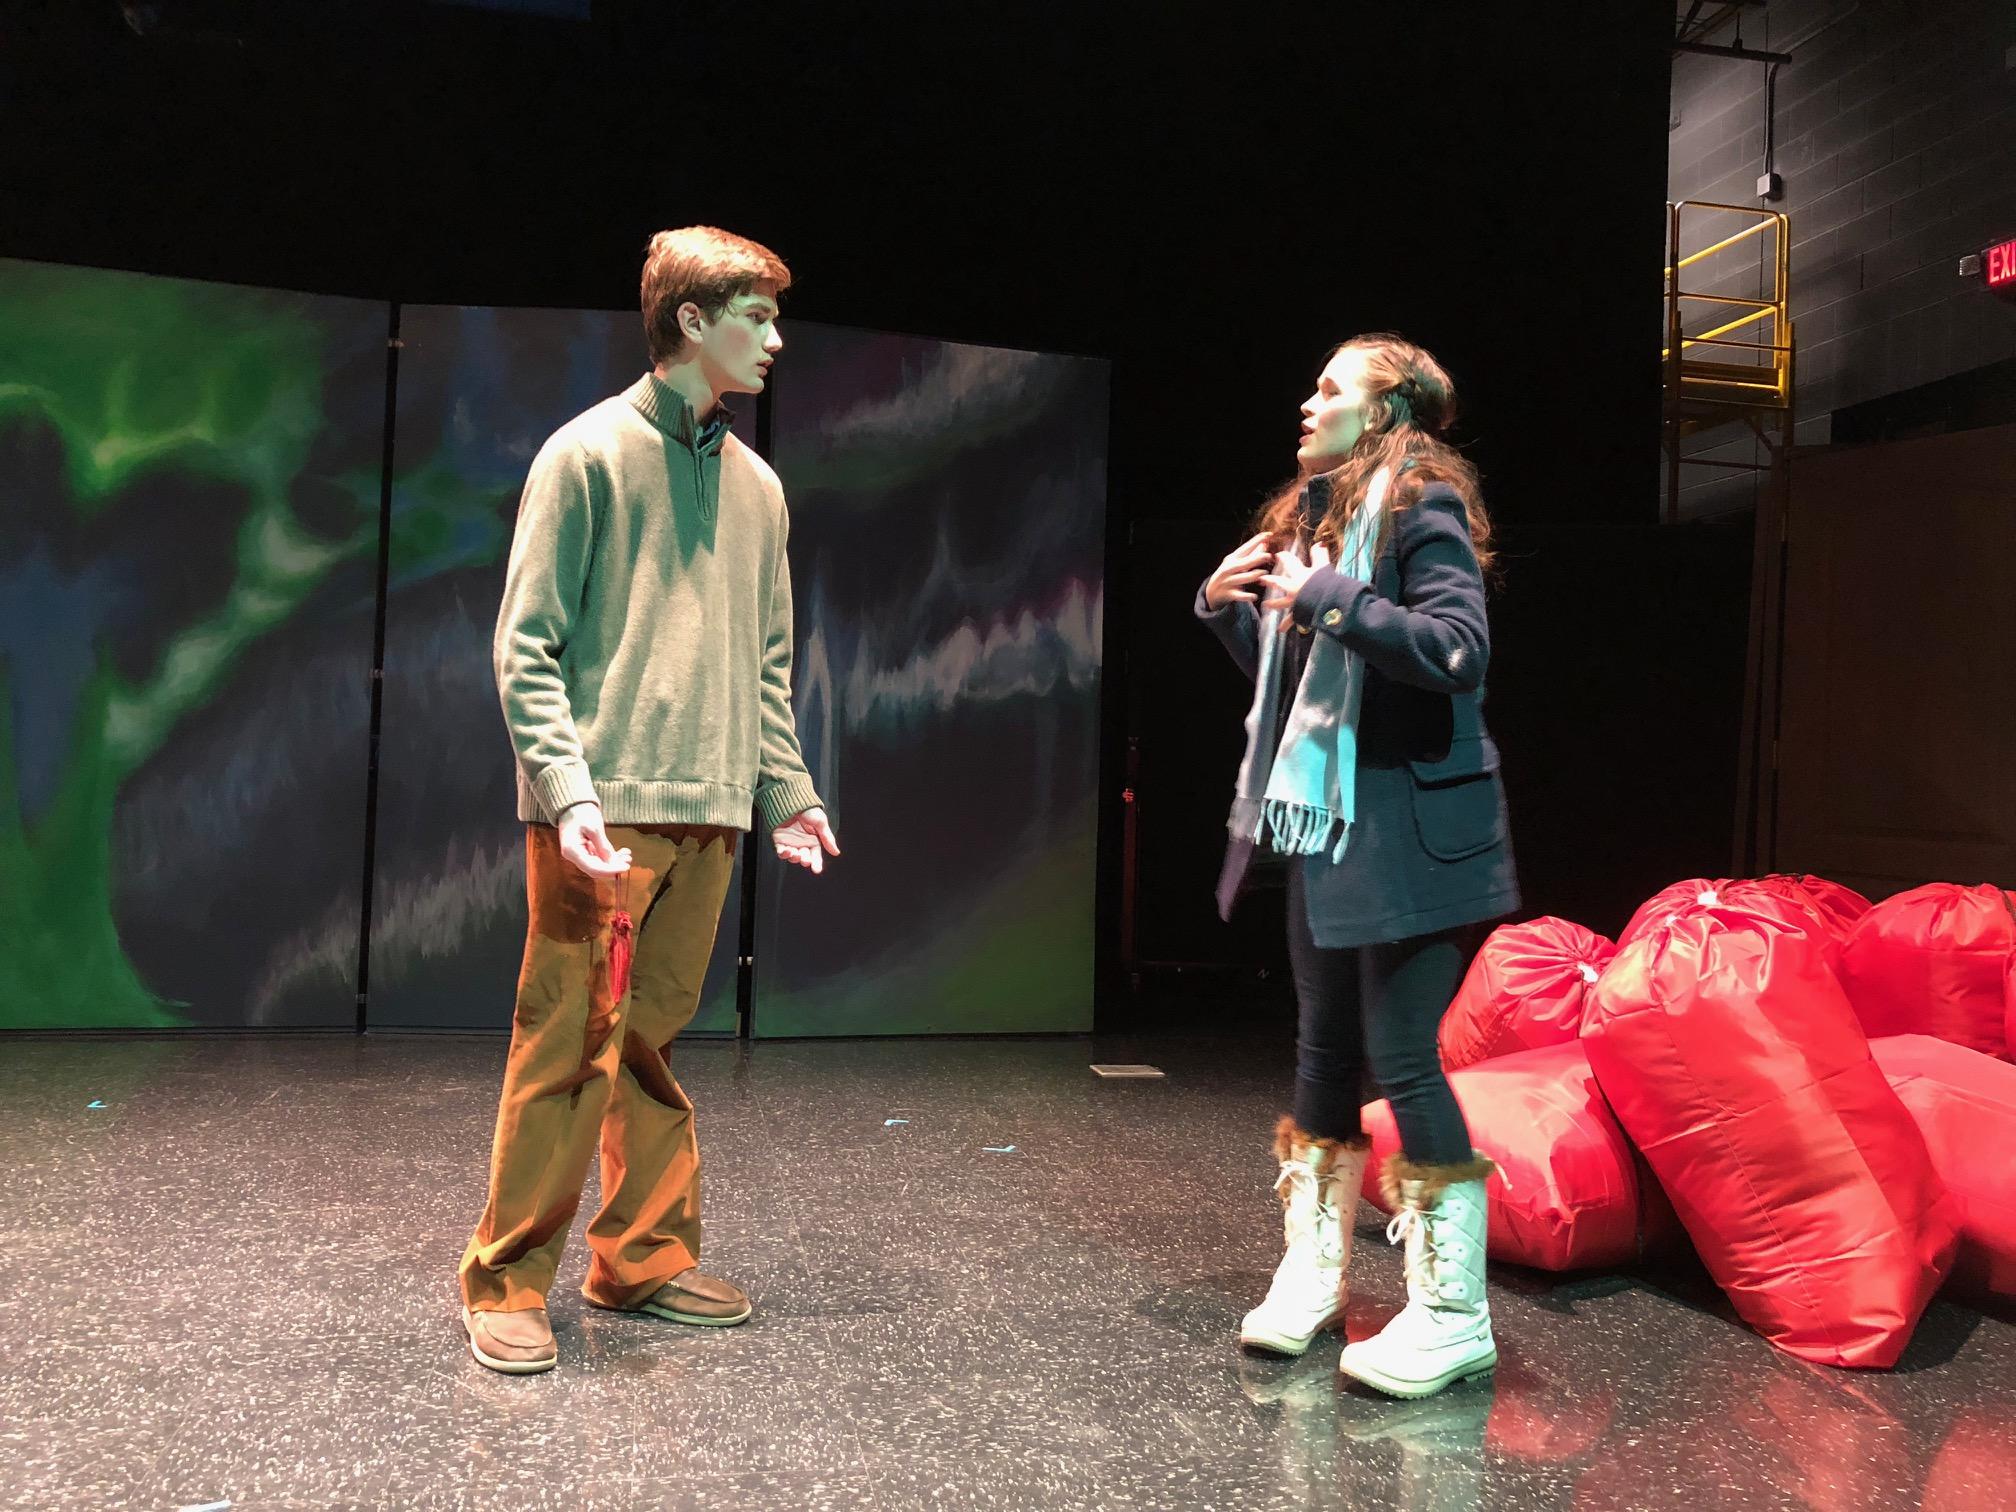 Ridge Lewis and Rachel Alexander-Lee in a confrontation scene.